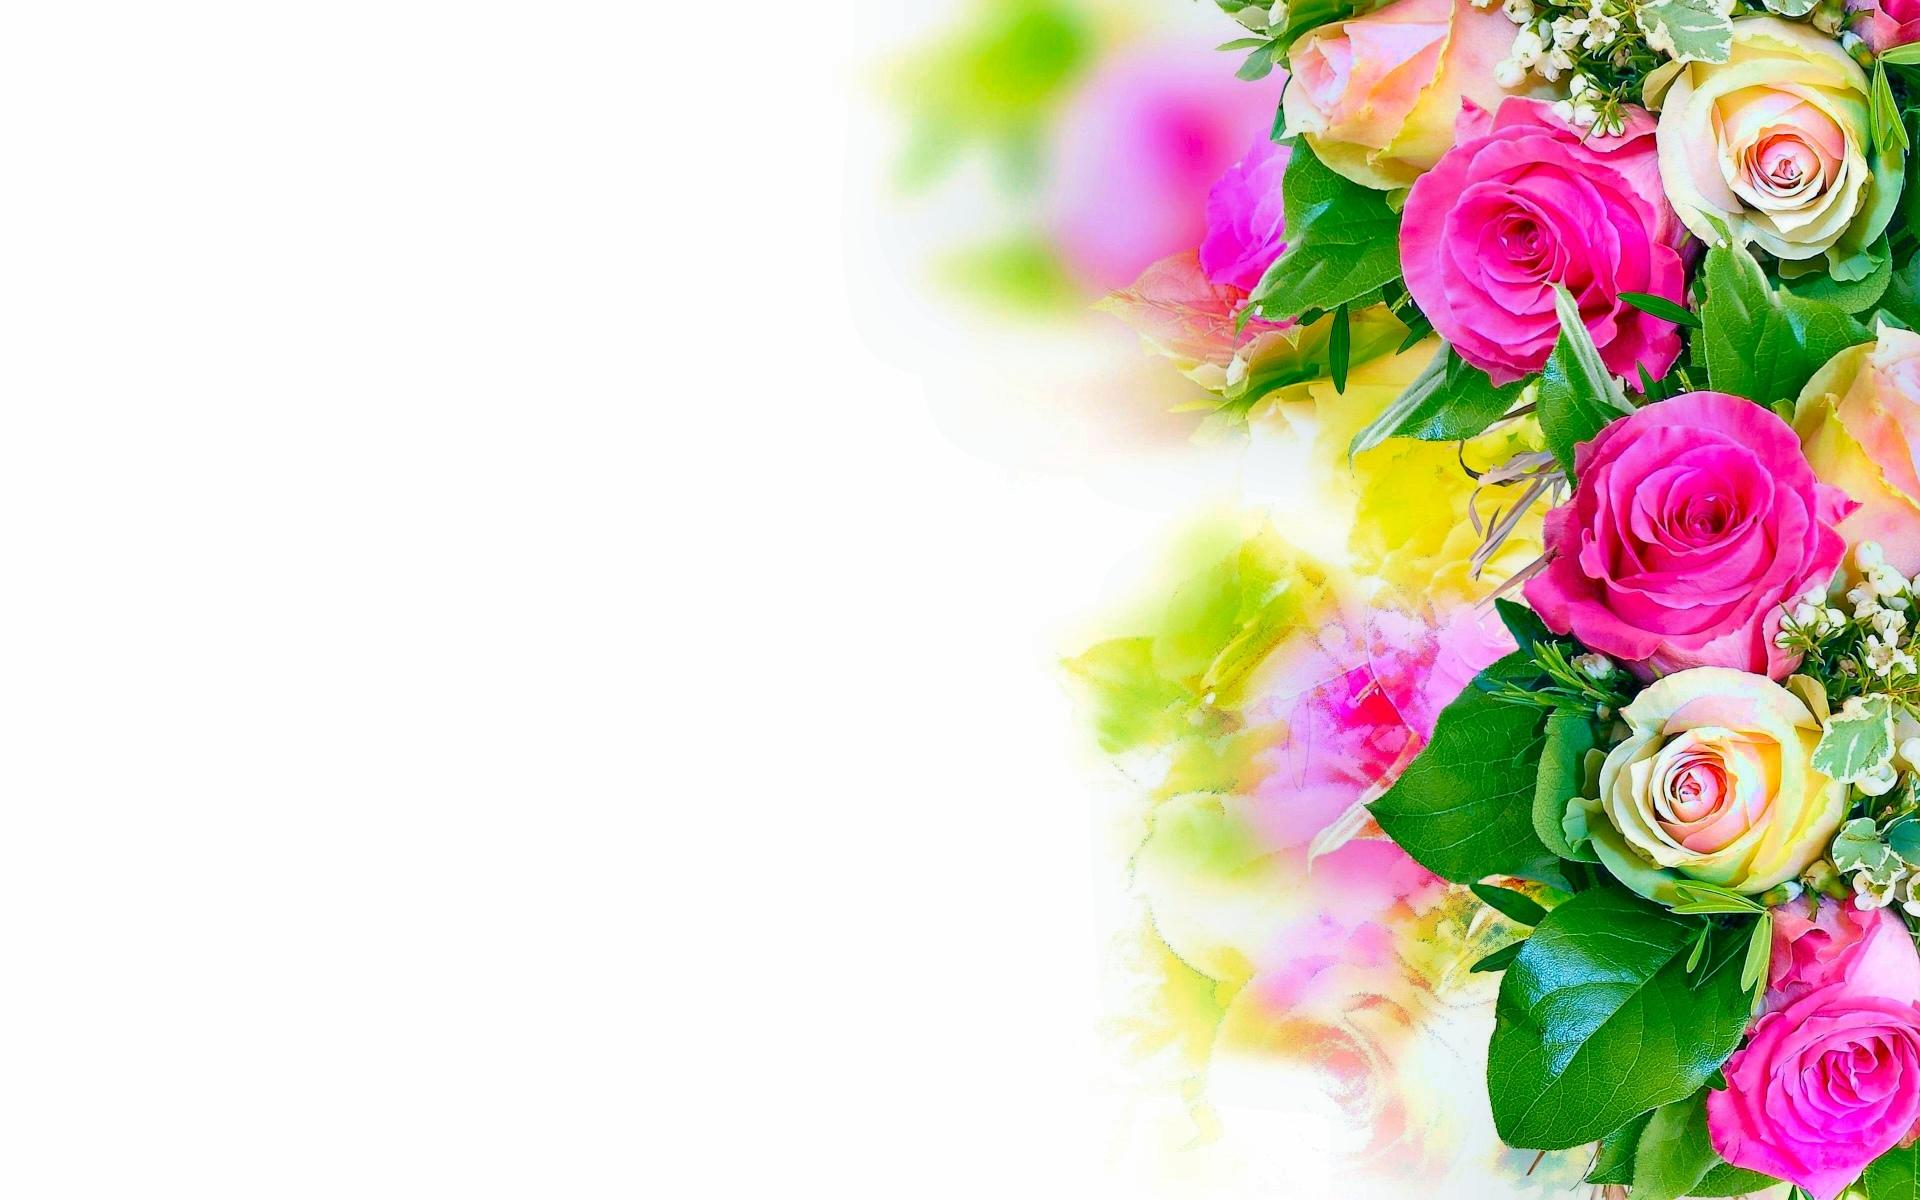 Fondos De Pantalla Hd Fondos: Fondos De Flores, Wallpapers HD Gratis